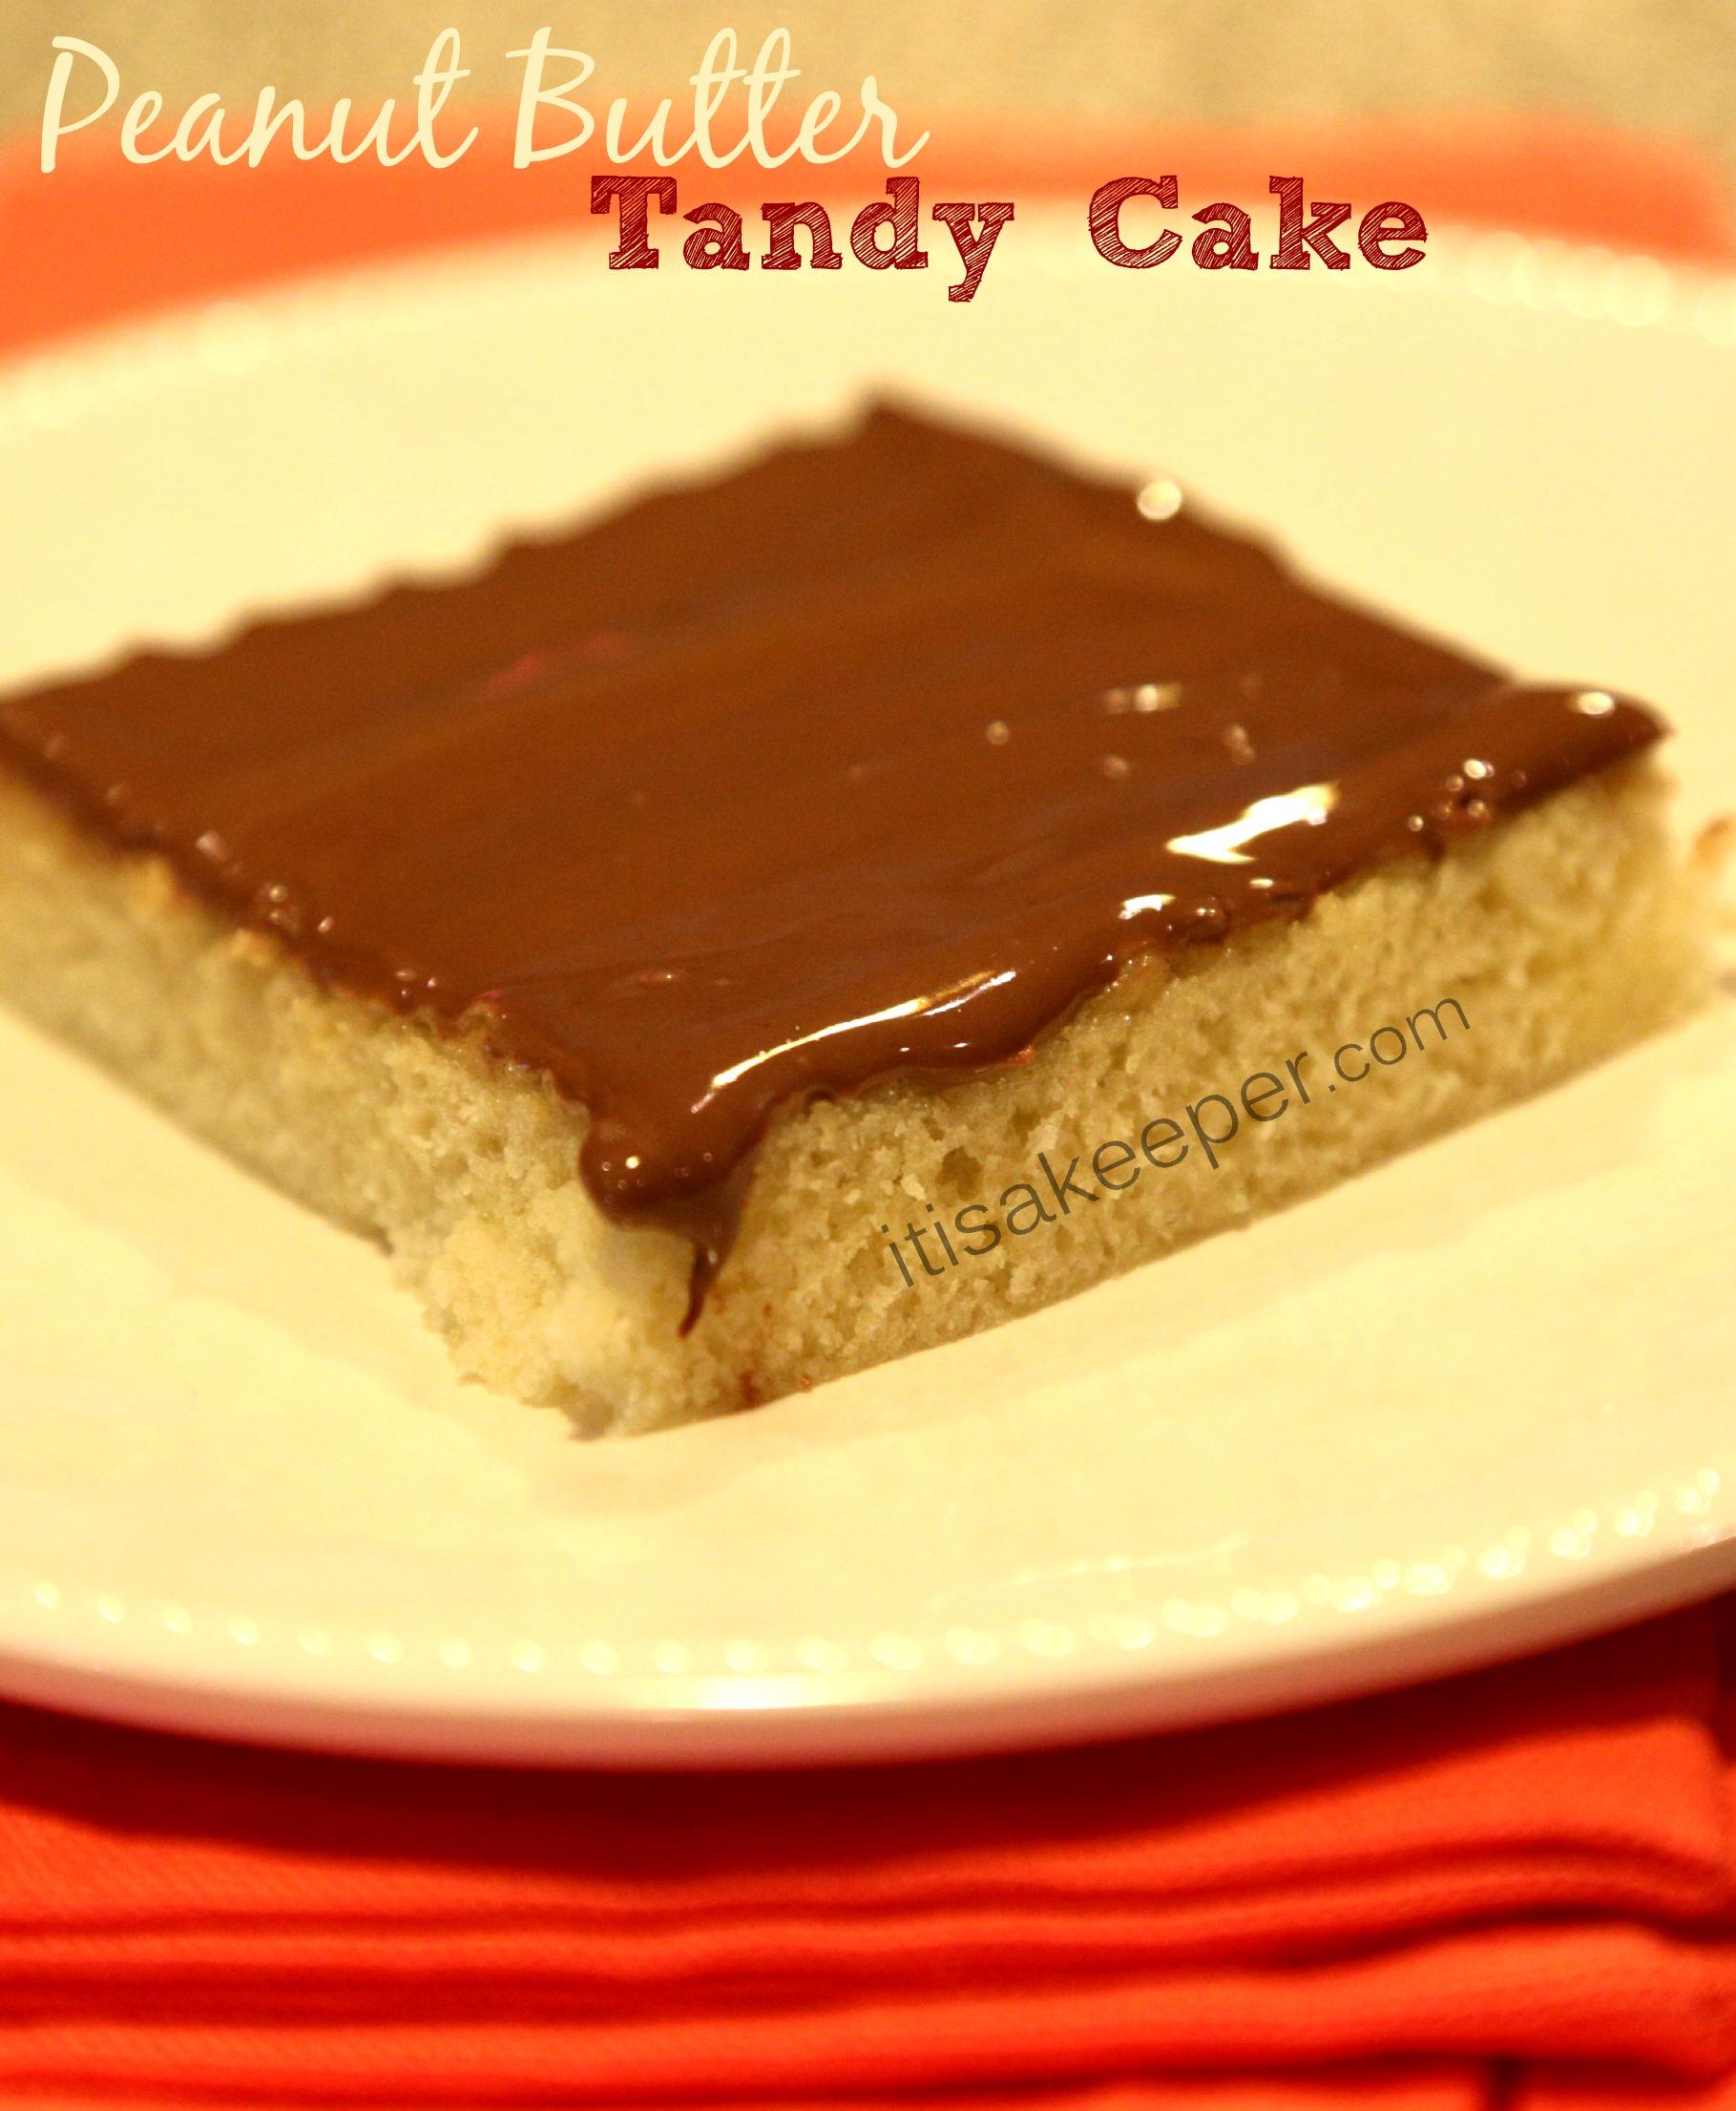 Peanut Butter Tandy Cake Recipe